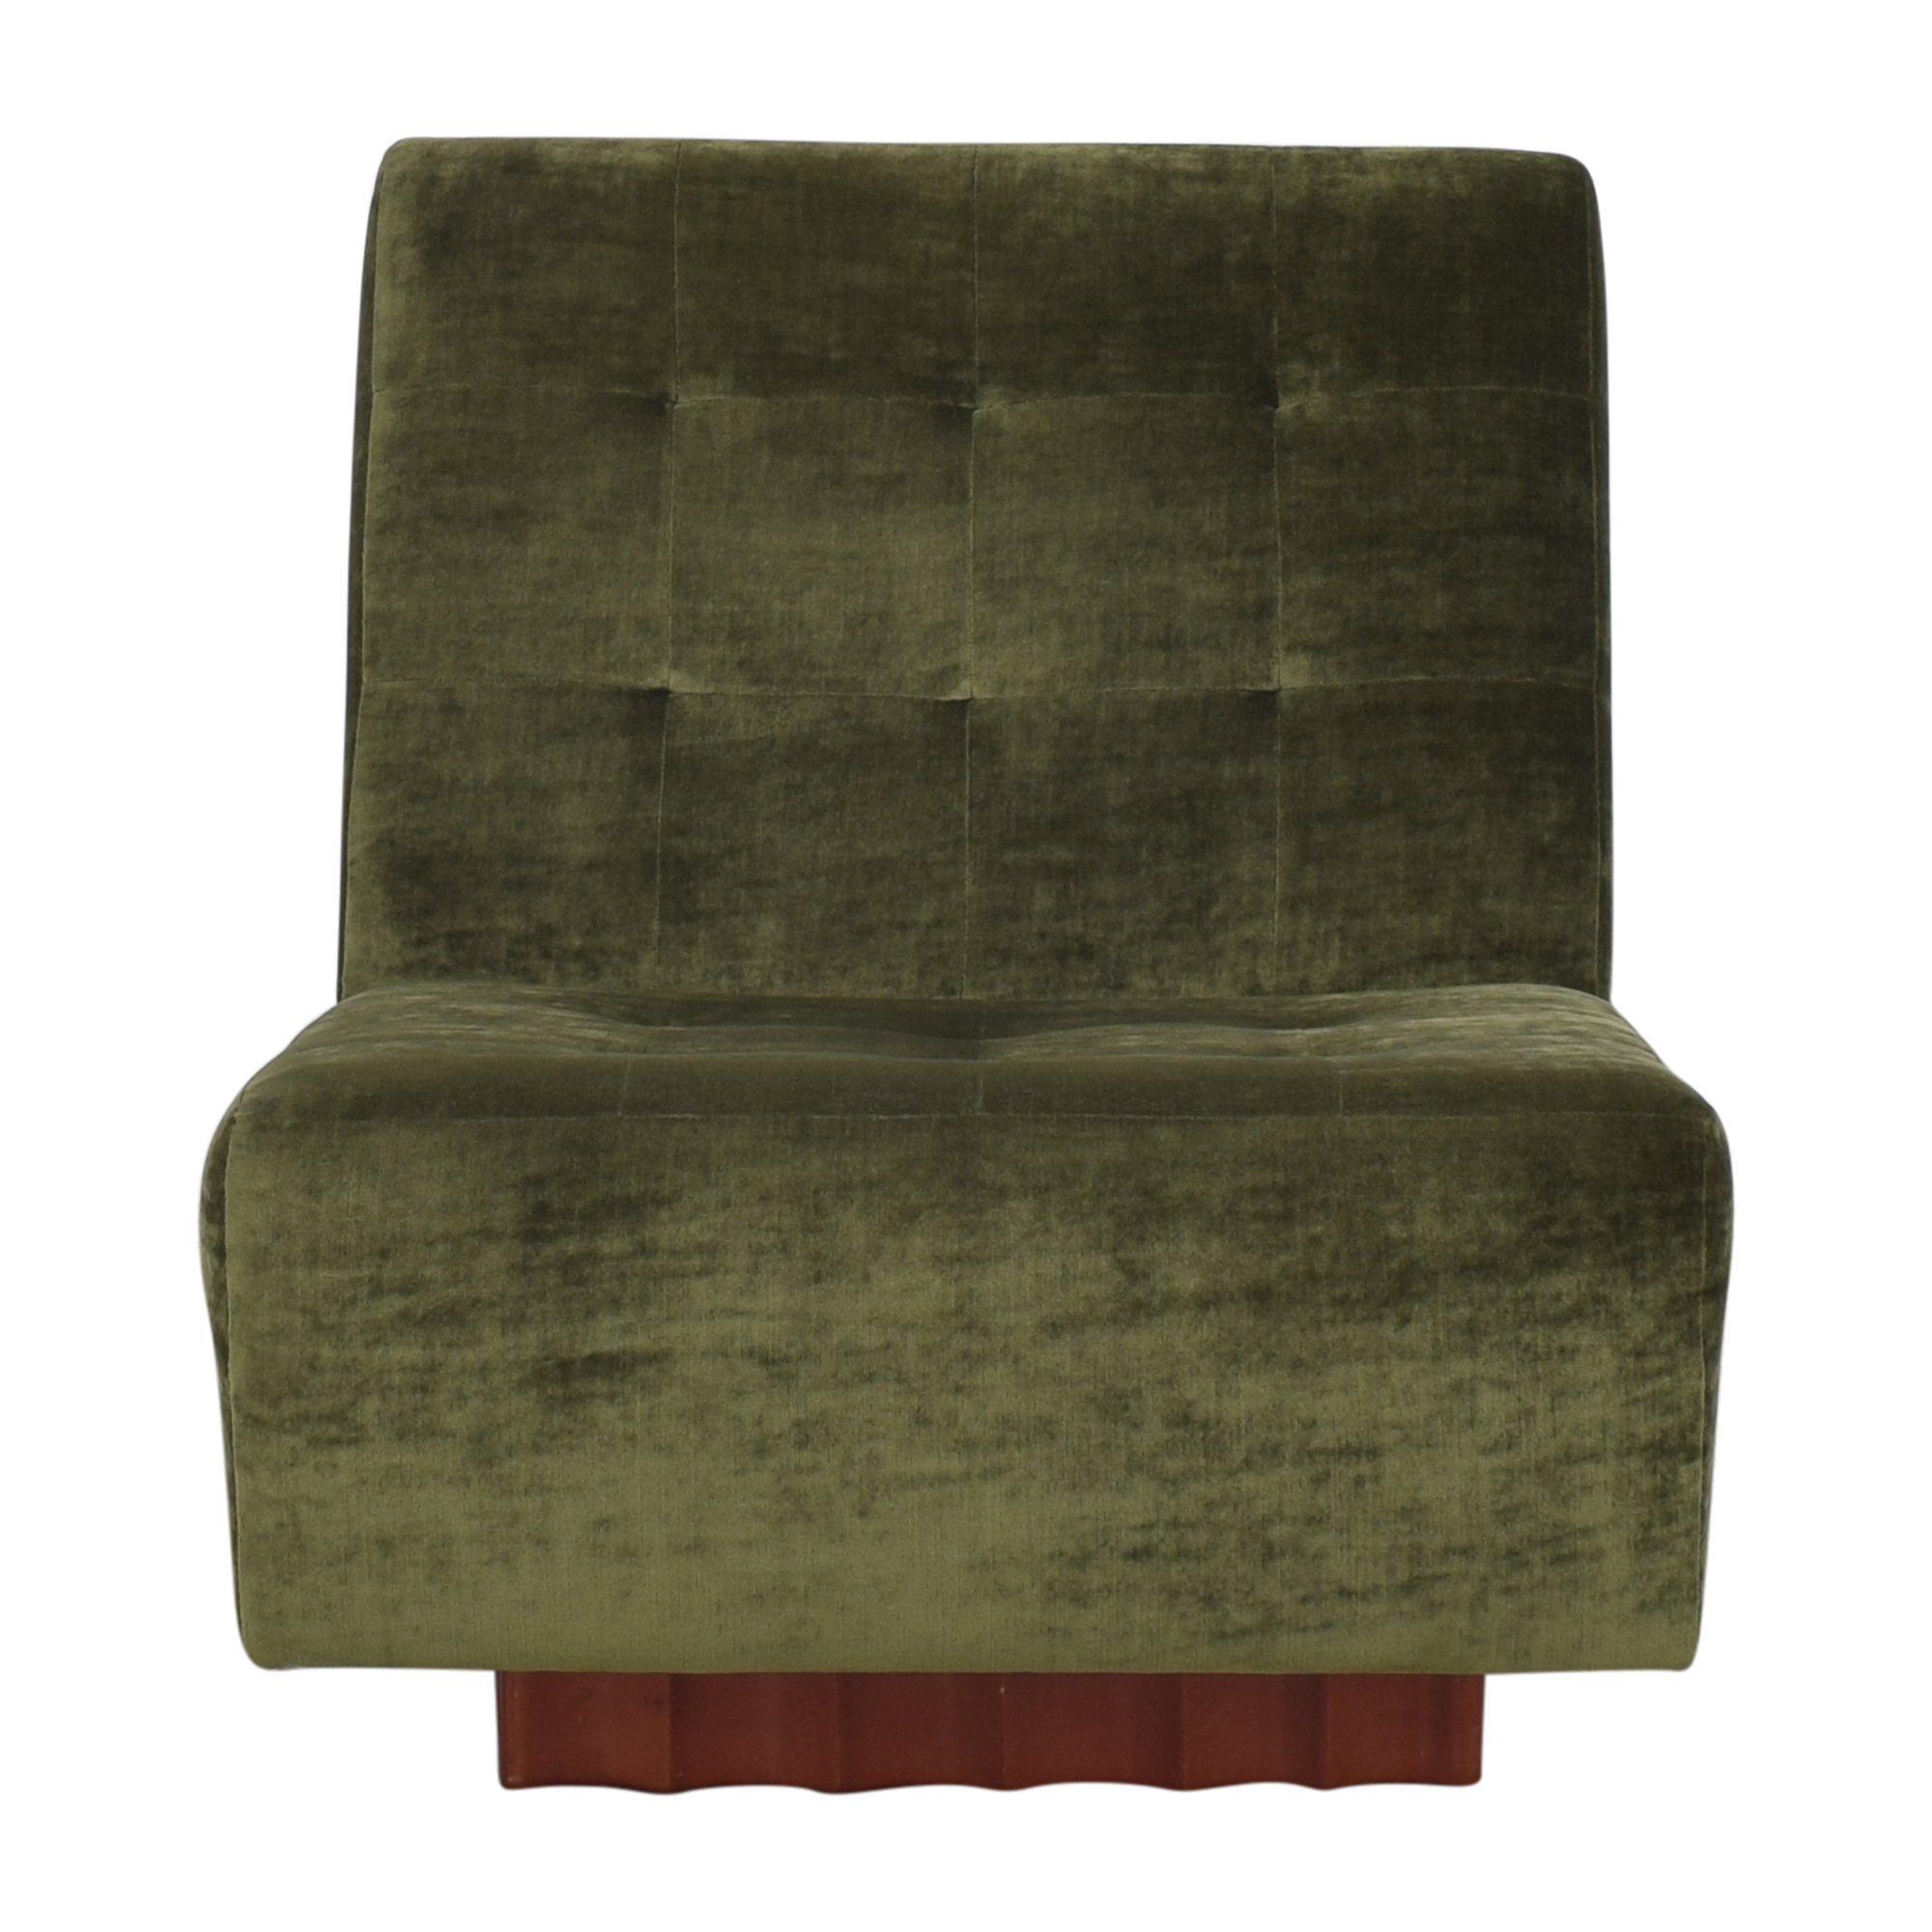 Dialogica Dialogica Swivel Tufted Slipper Chair ma